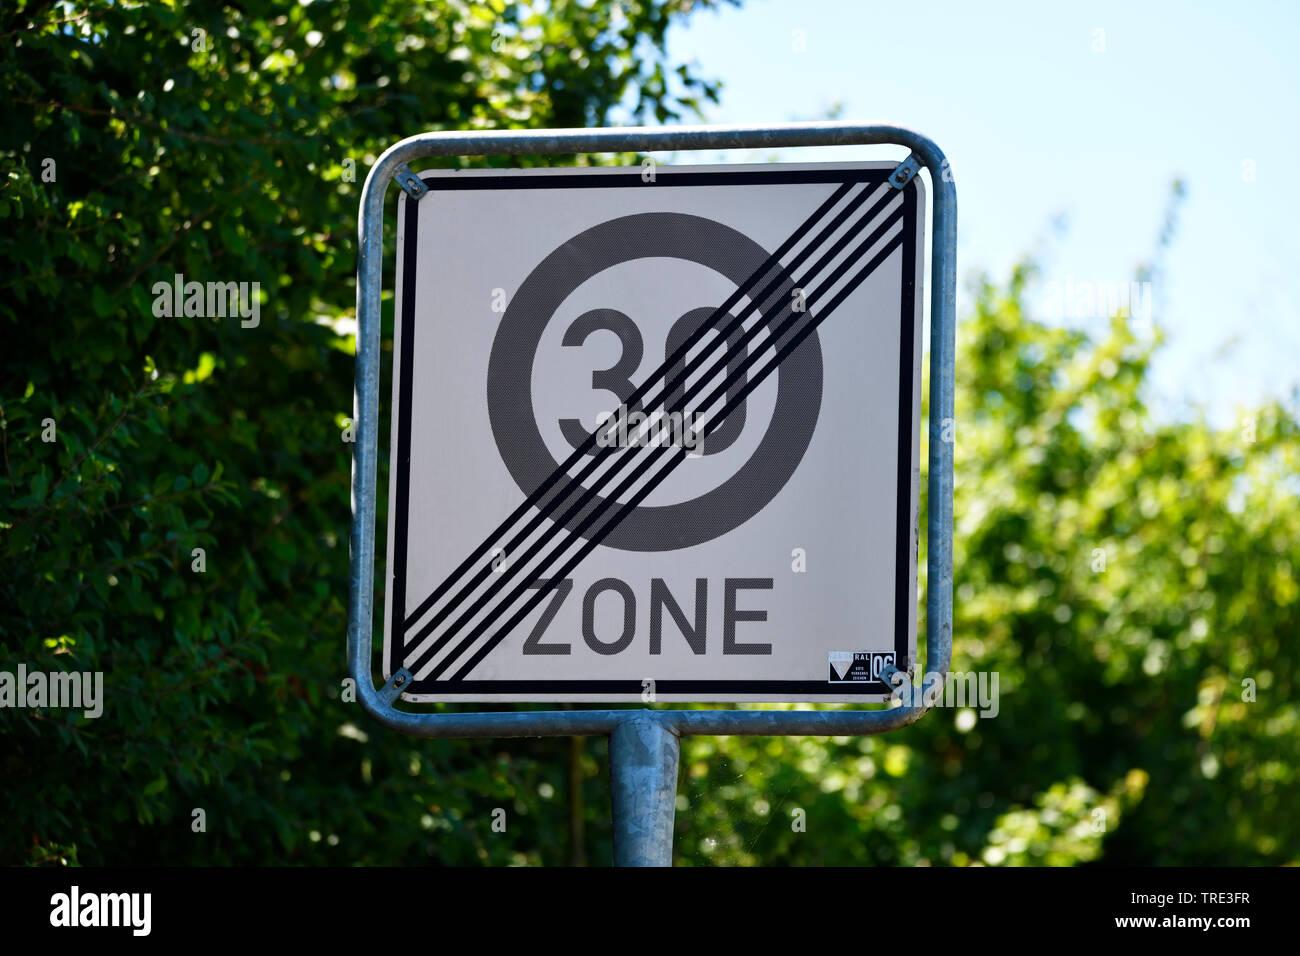 Schild Ende Tempo-30-Zone, Deutschland | sign limit of 30 kph zone, Germany | BLWS516328.jpg [ (c) blickwinkel/McPHOTO/C. Ohde Tel. +49 (0)2302-279322 - Stock Image